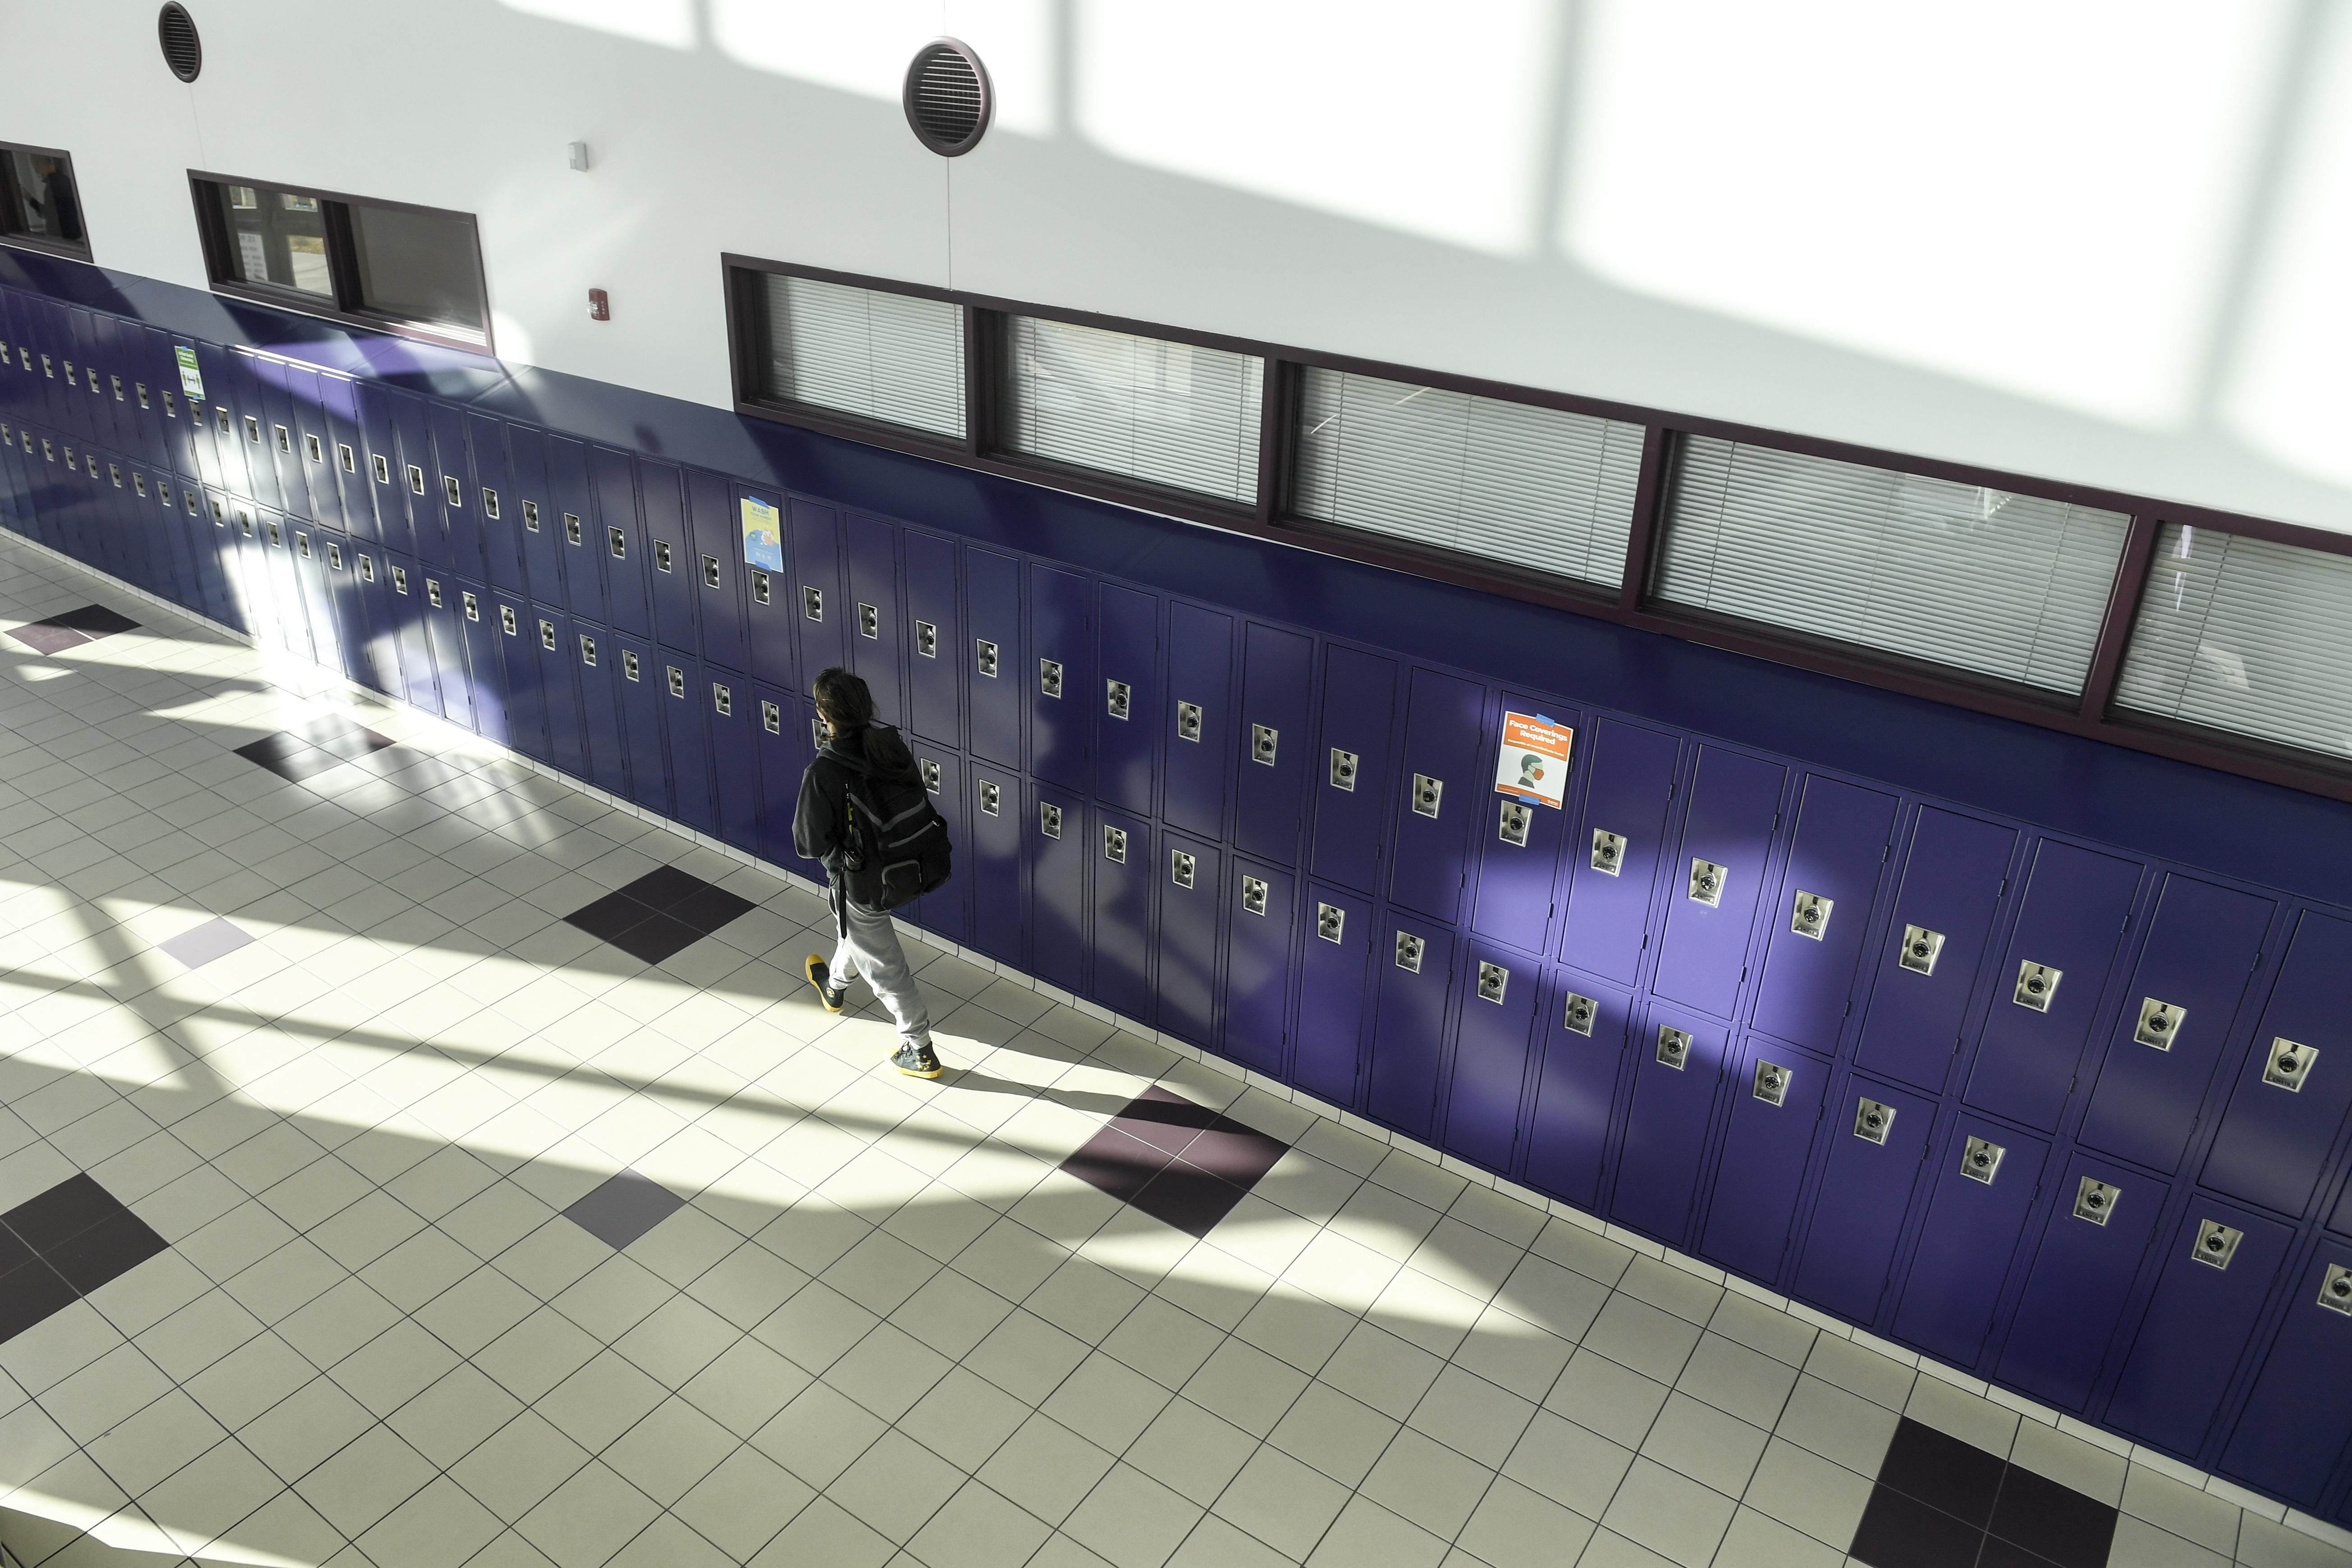 A high school student walks in an empty hallway past a row of purple lockers.